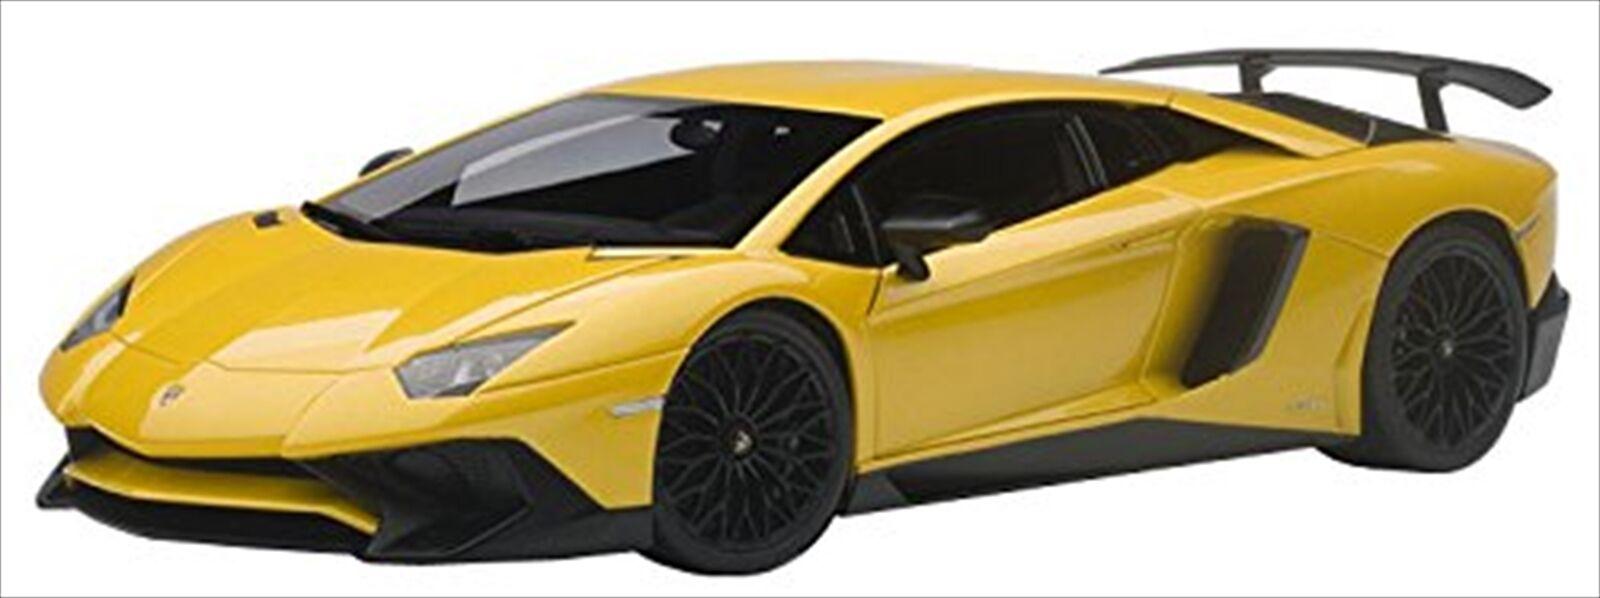 Autoart 1 18 Lamborghini Aventador LP750-4 SV Metálico Amarillo 74558